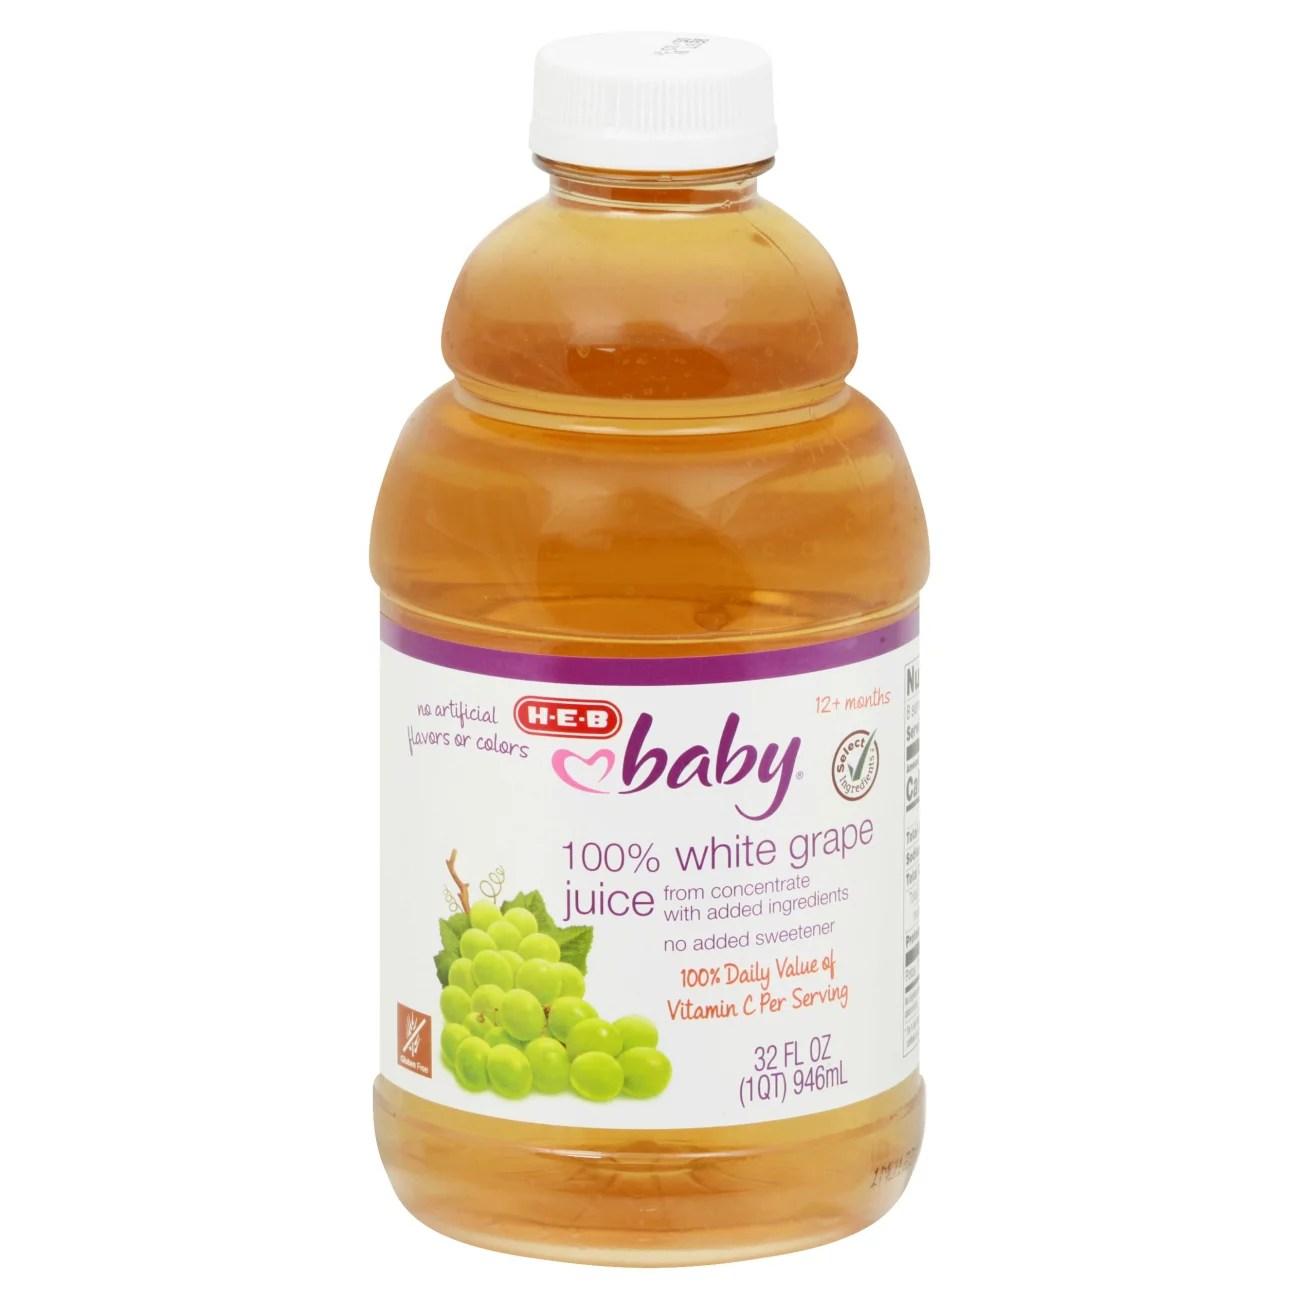 H-E-B Baby 100% White Grape Juice - Shop Juice & Water at ...